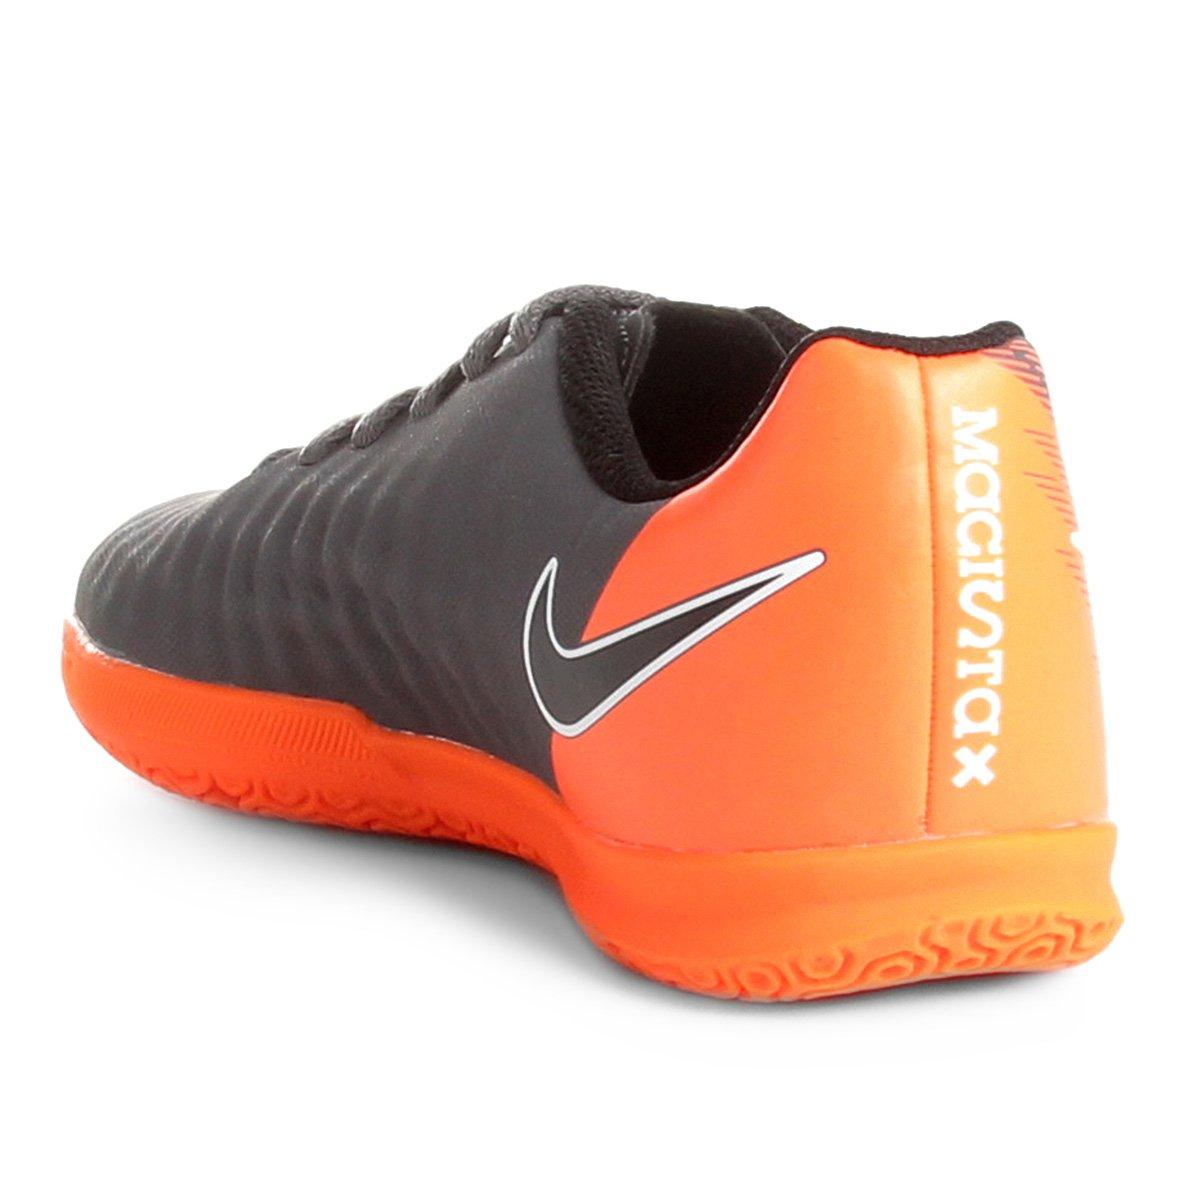 ... Chuteira Futsal Nike Magista Obra 2 Club Infantil - Compre Agora ...  fa26659ebcb2e1 ... db40f9df14890